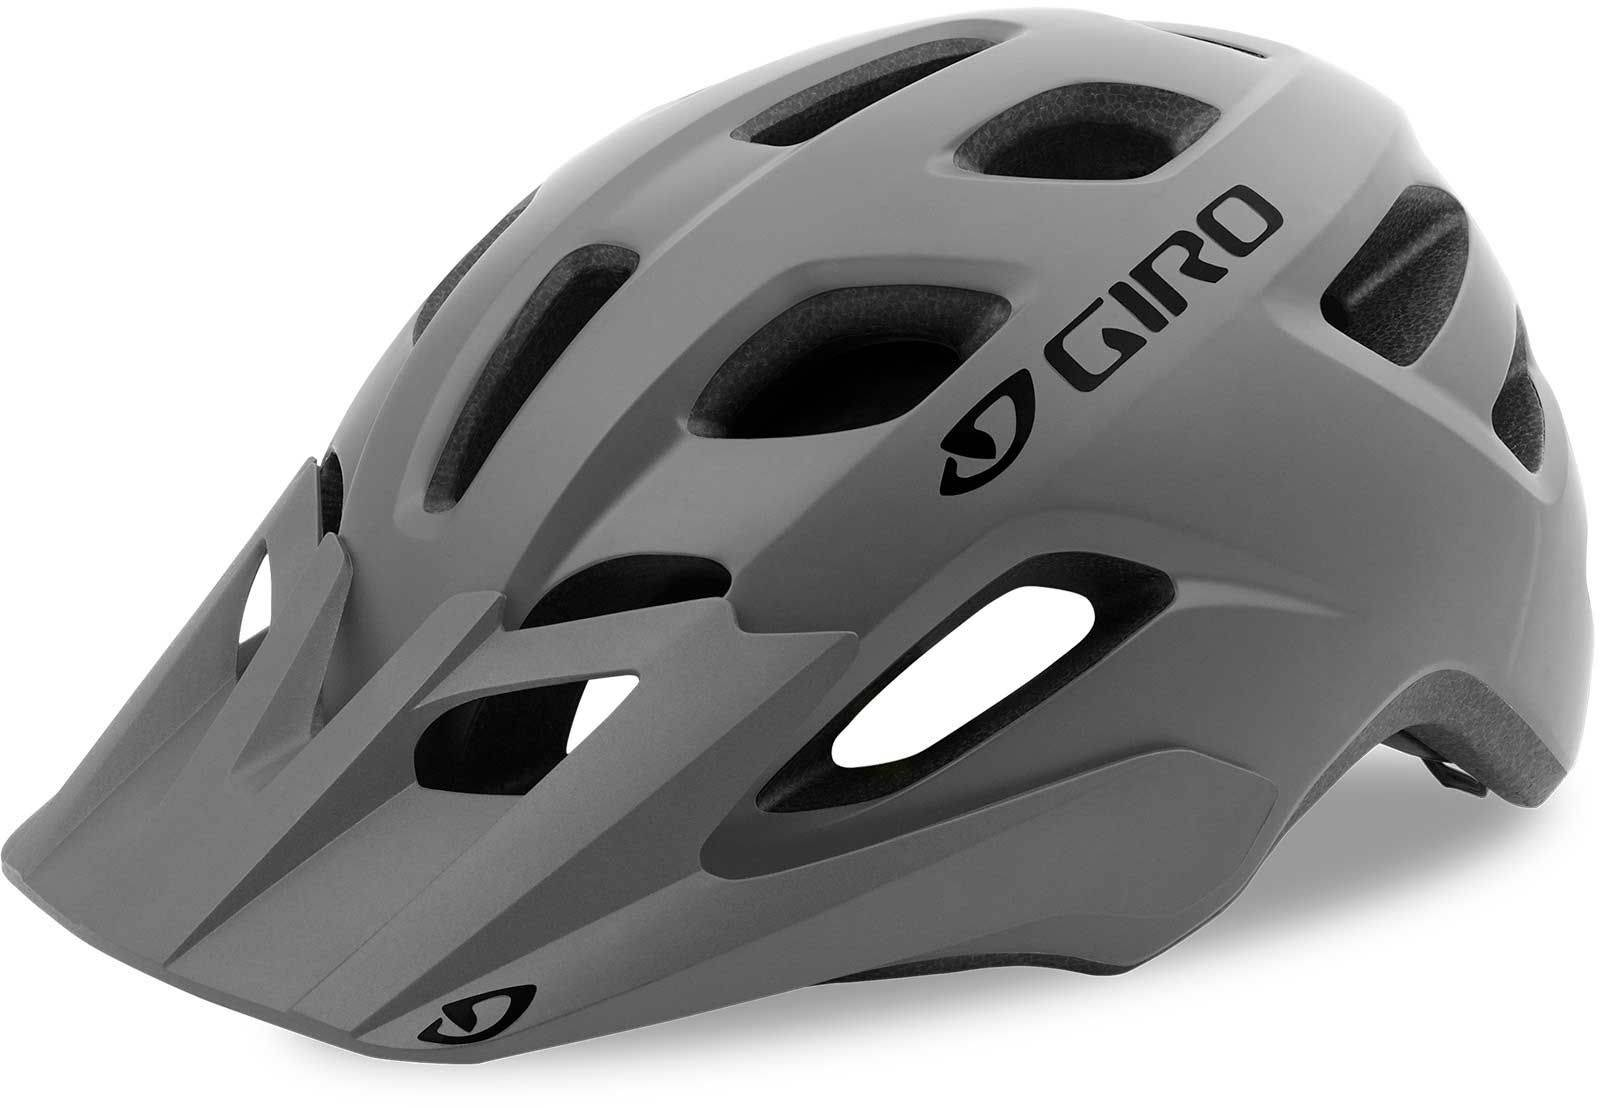 Giro Adult Fixture MIPS Bike Helmet, Universal, Gray